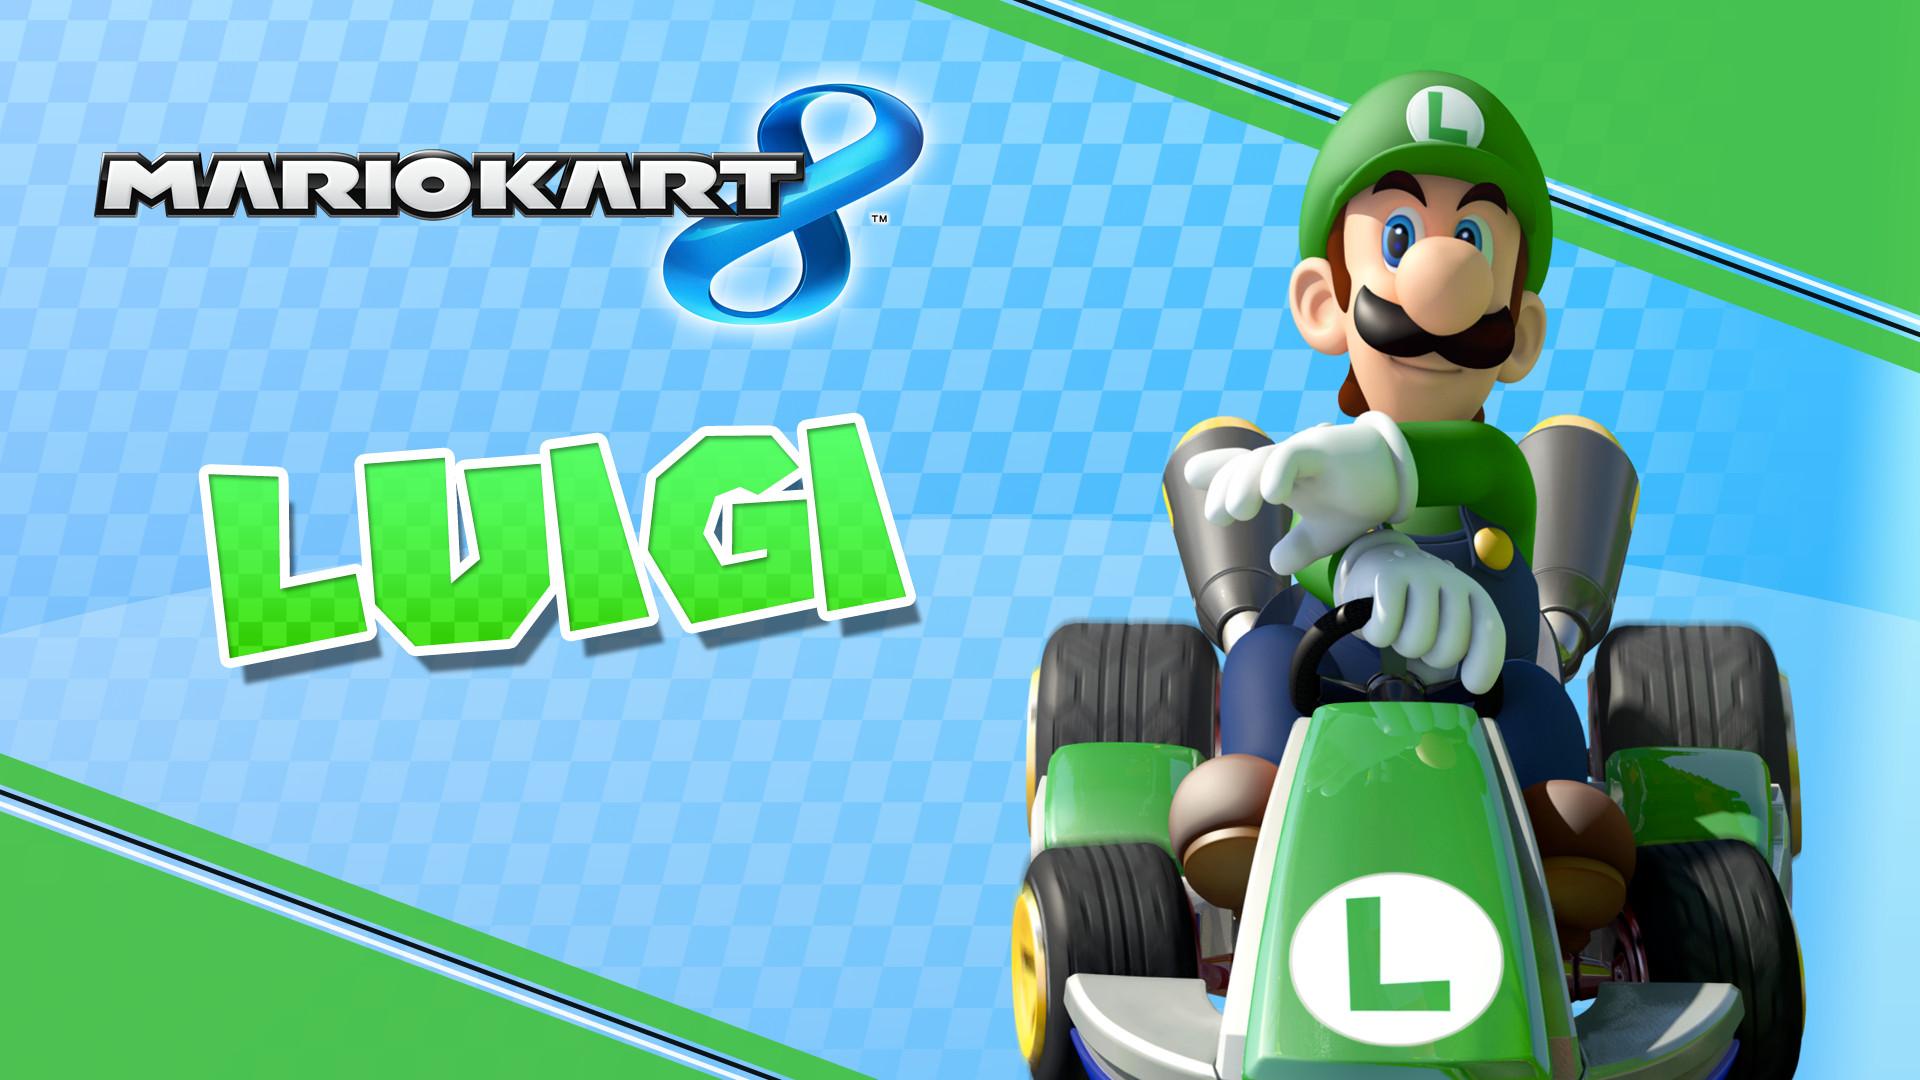 Mario Kart 8 Background: Mario Kart 8 Rosalina Wallpaper (76+ Images